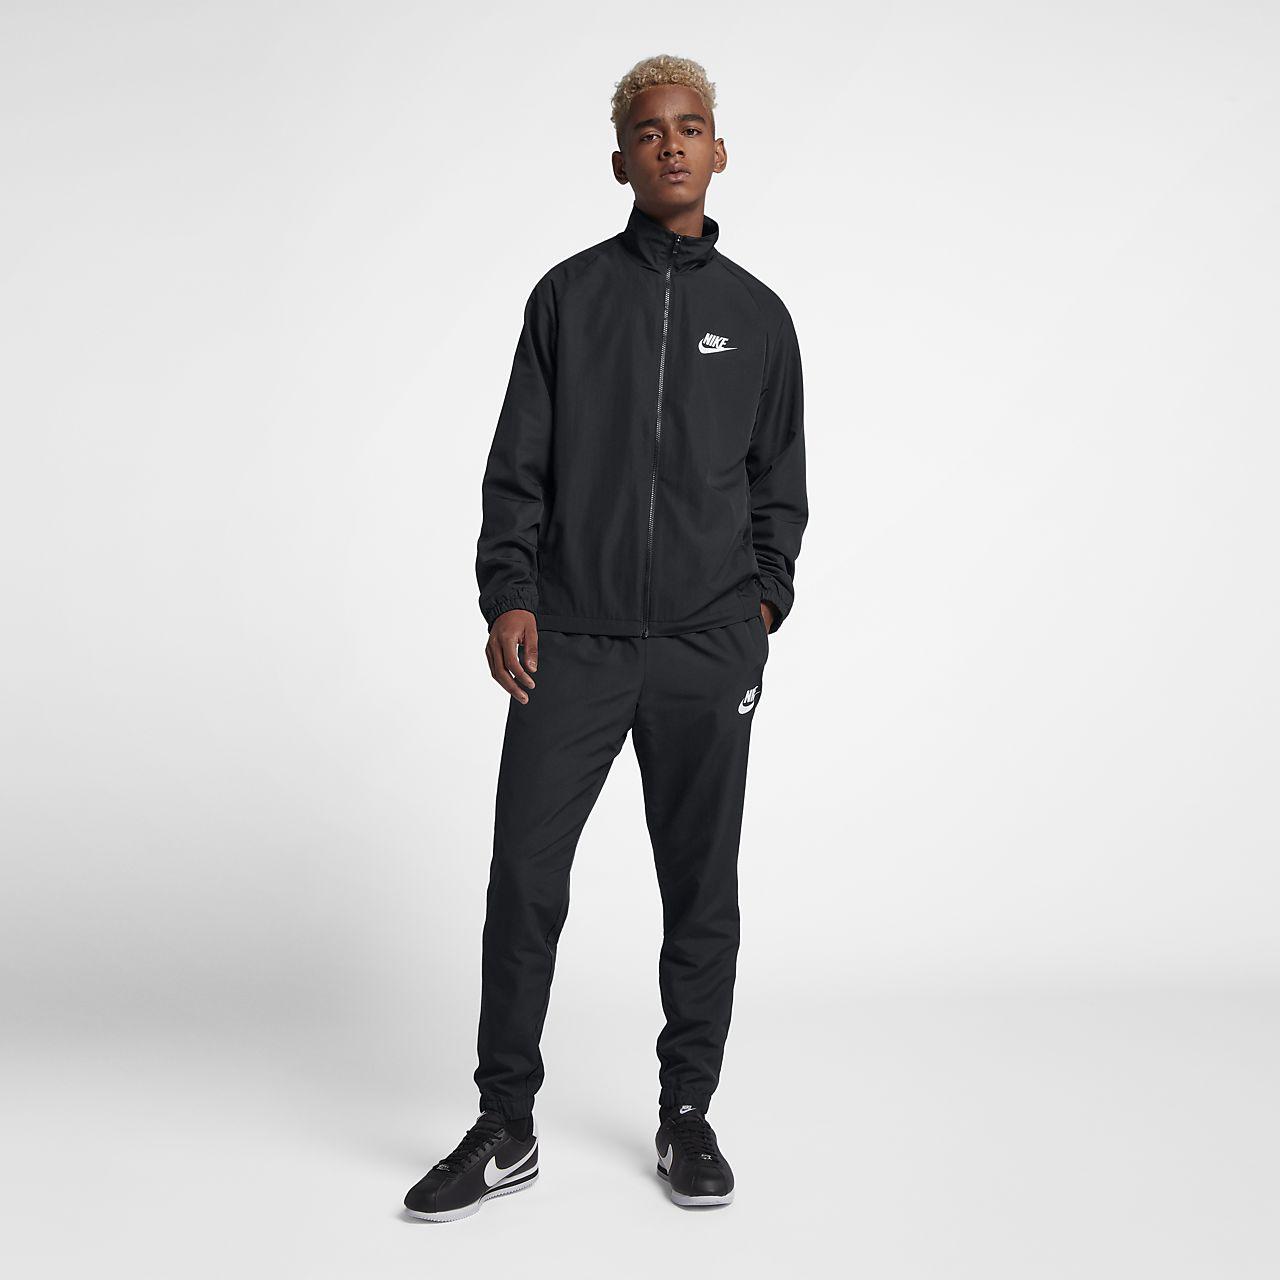 bcdea0314 Nike Sportswear Chándal de tejido Woven - Hombre. Nike.com ES